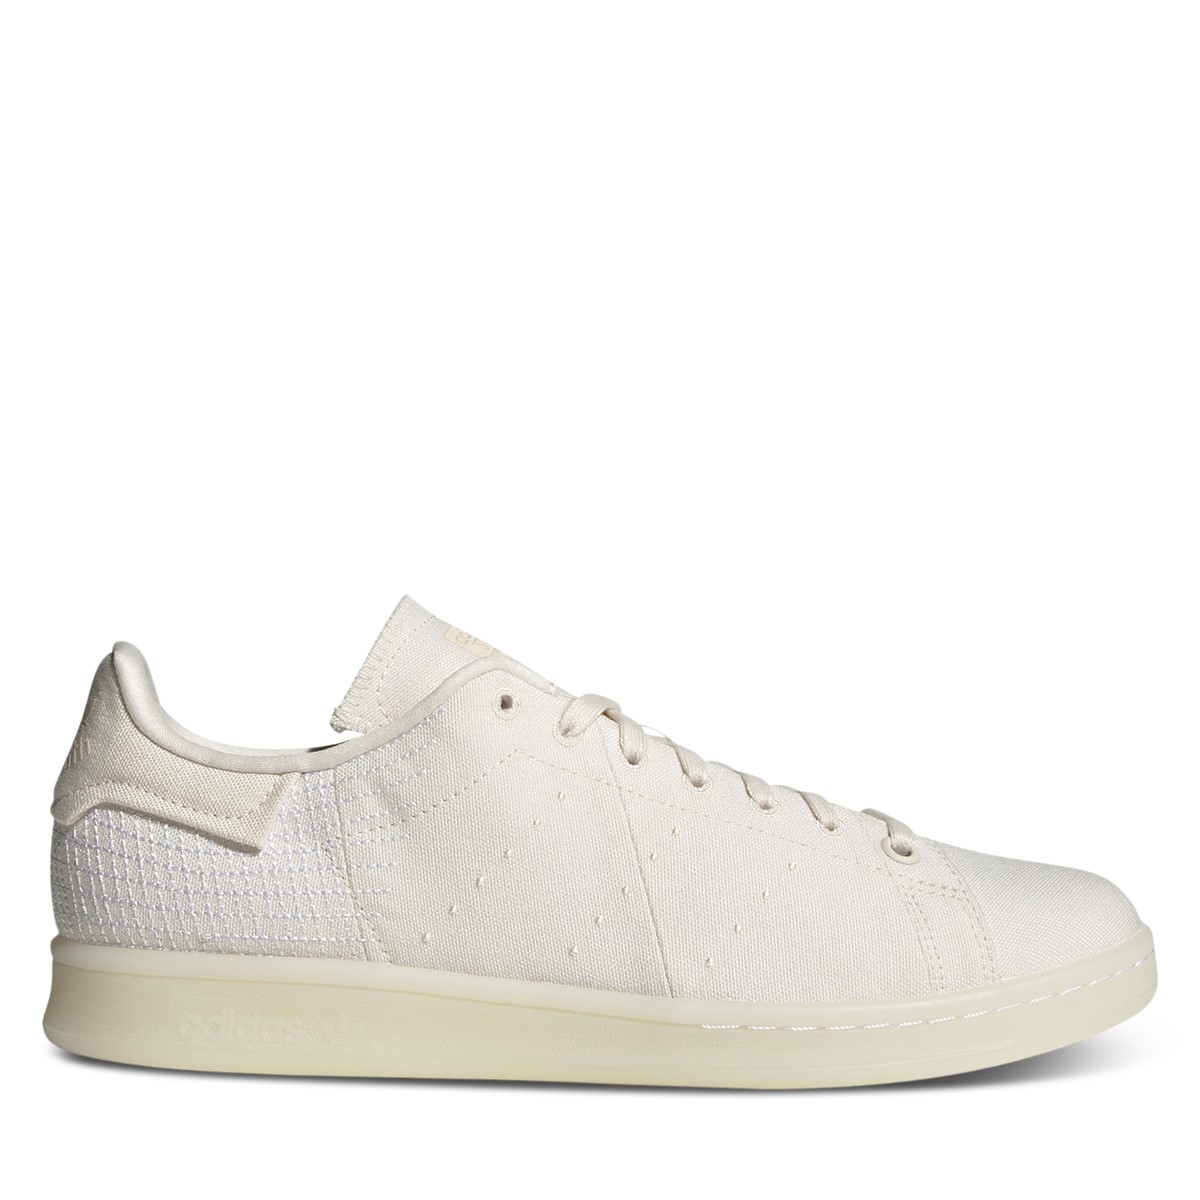 Primeblue Stan Smith Sneakers in Off-White